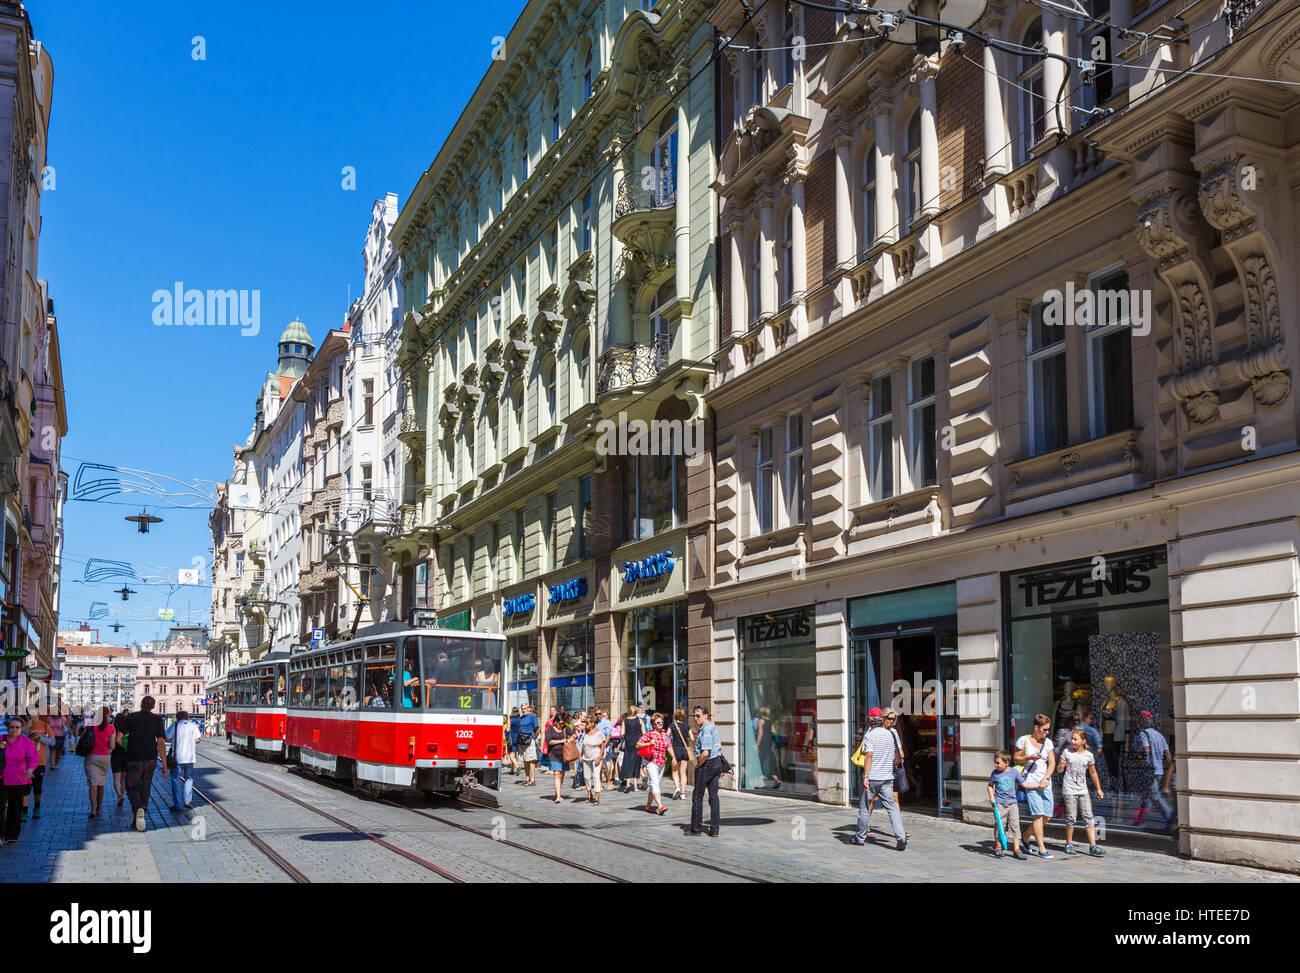 Brno. Shops and tram on Masarykova in the city centre, Brno, Moravia, Czech Republic - Stock Image